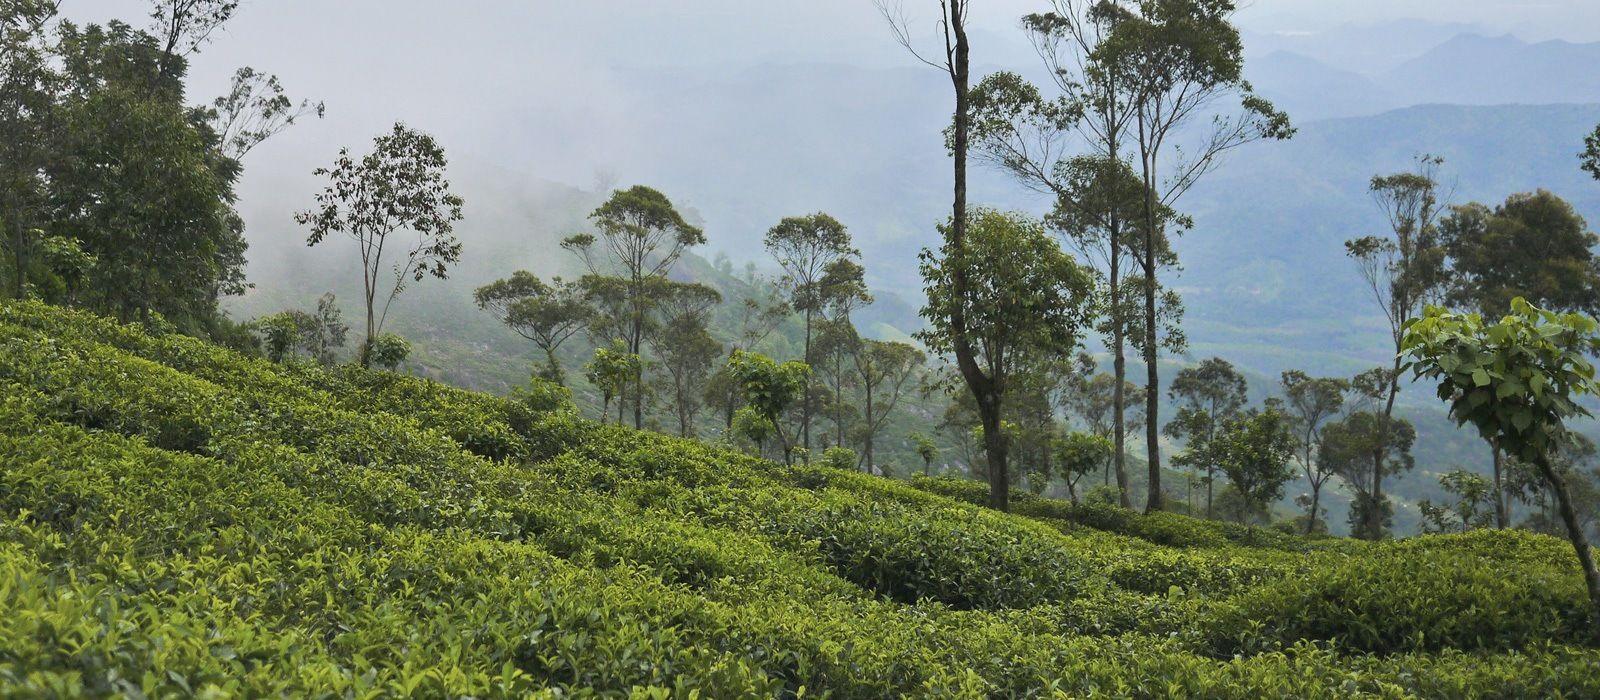 Simply Sri Lanka: Temples and Tea Tour Trip 2